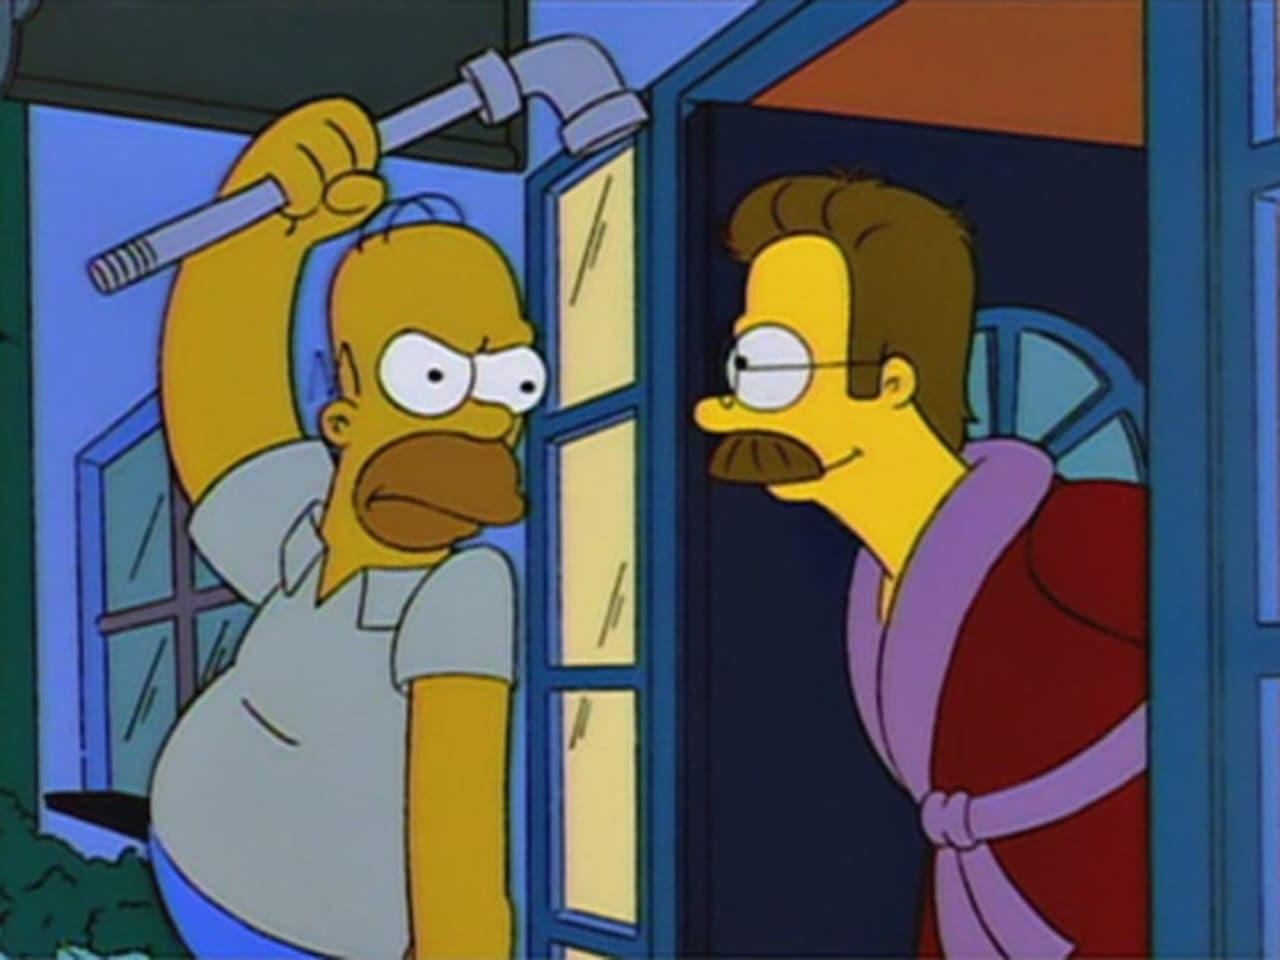 The Simpsons - Season 5 Episode 16 : Homer Loves Flanders